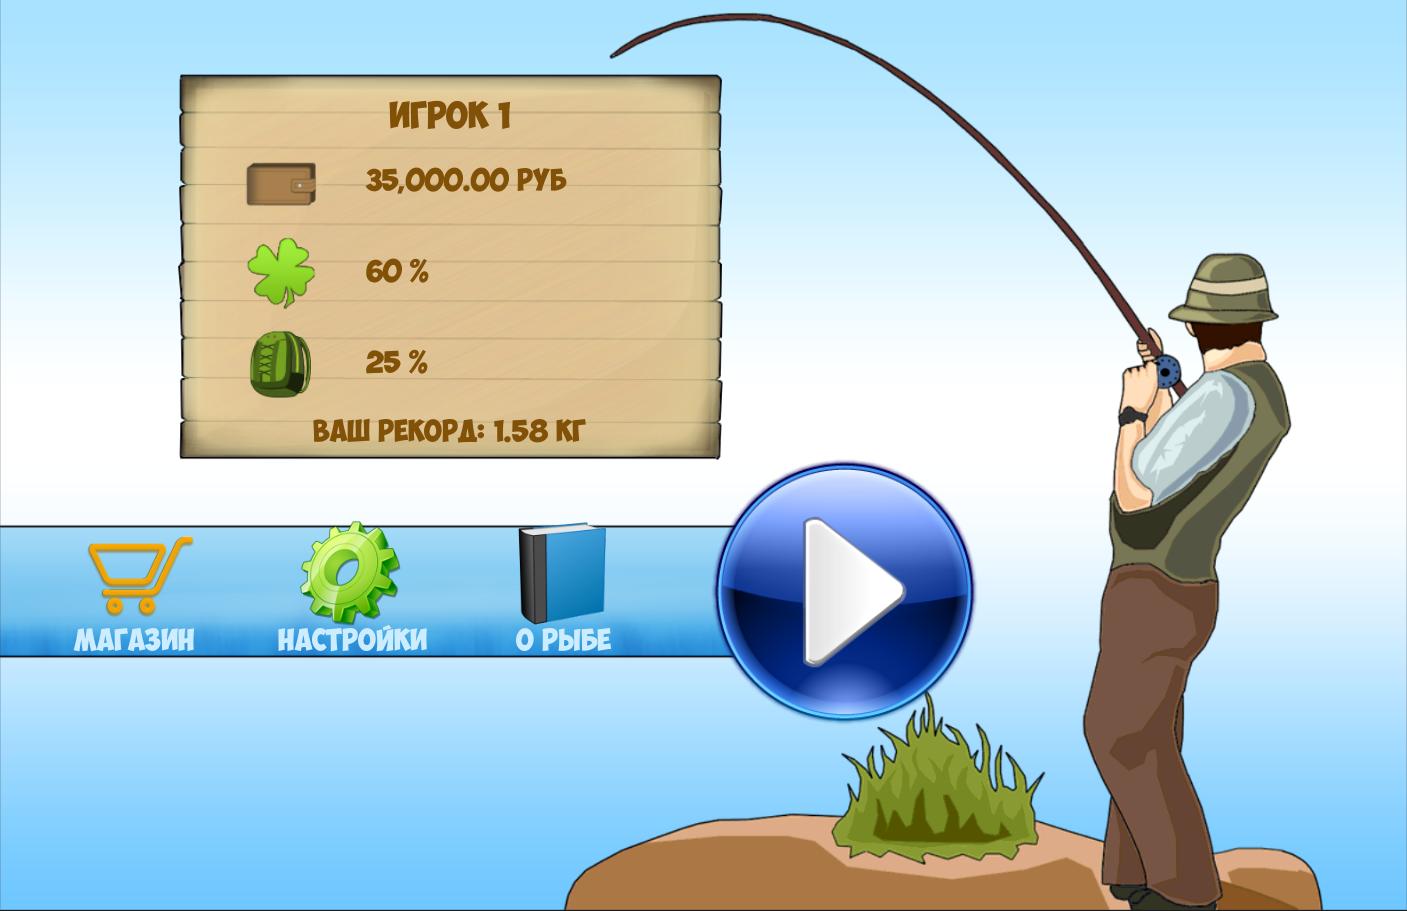 рыбалка 3d симулятор. озера